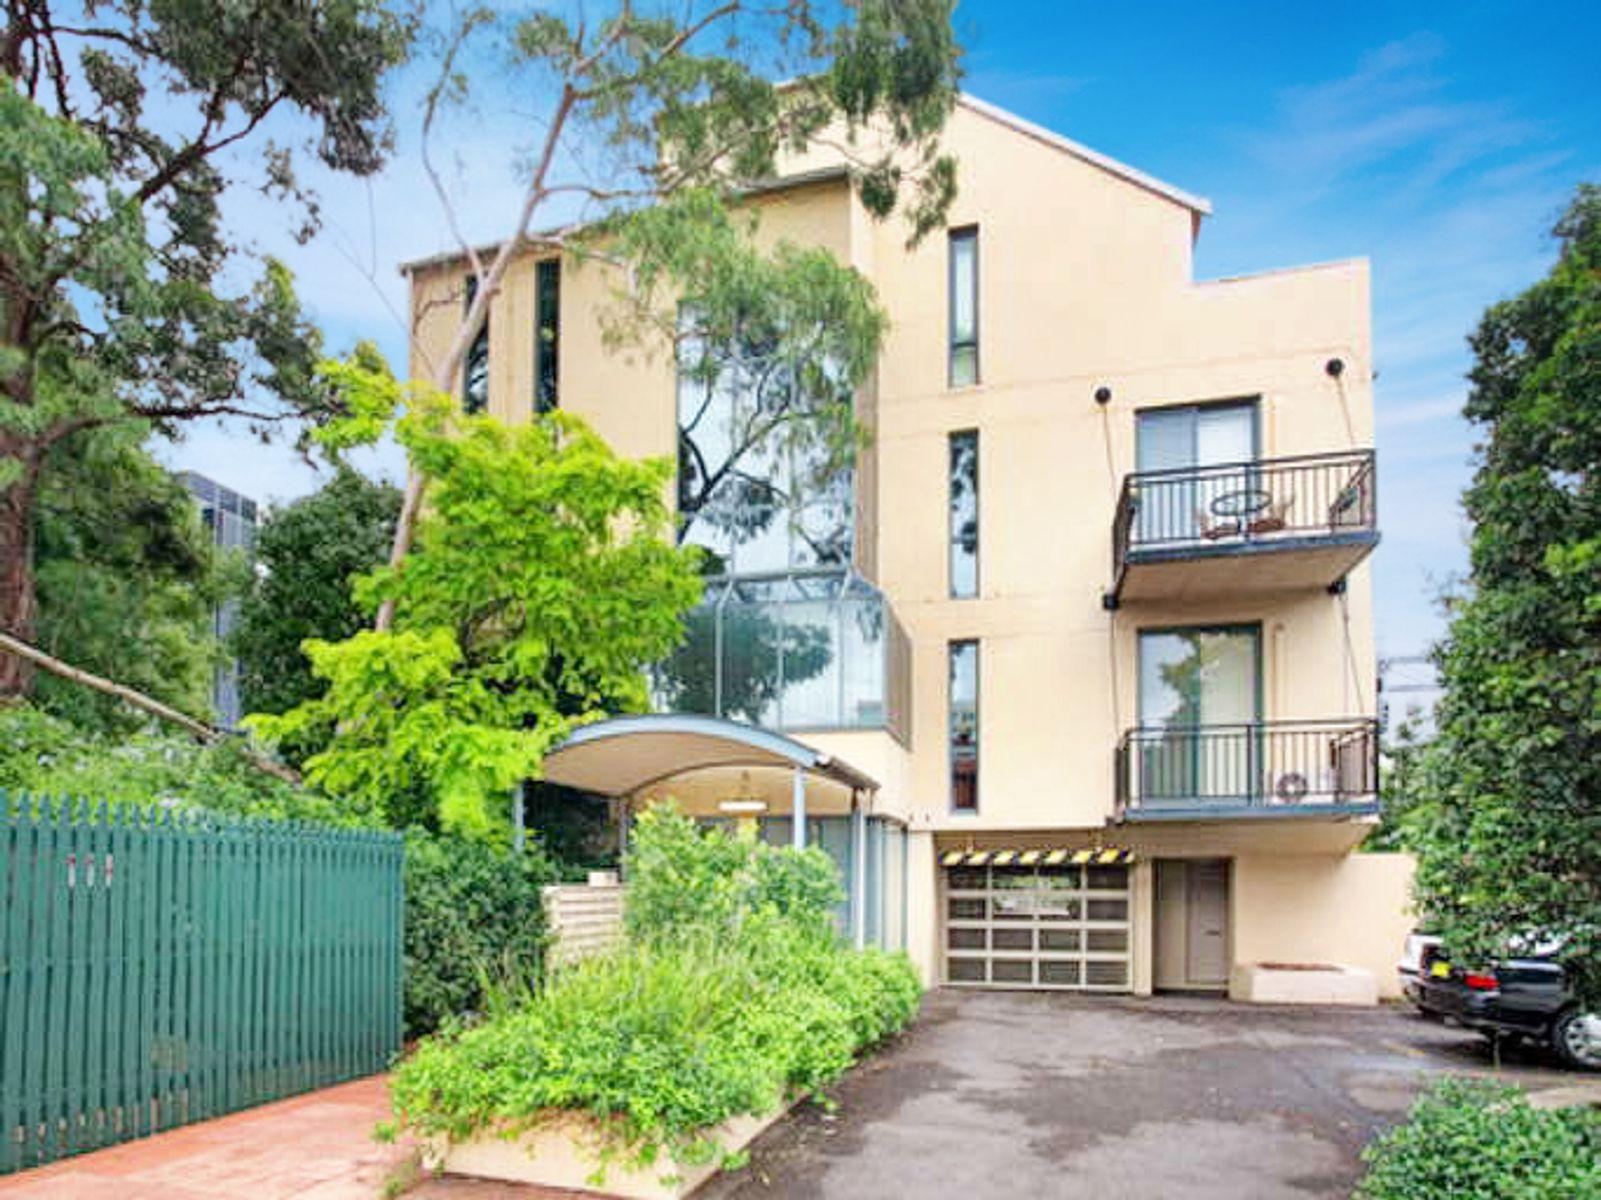 41/8 Cavill Avenue, Ashfield, NSW 2131